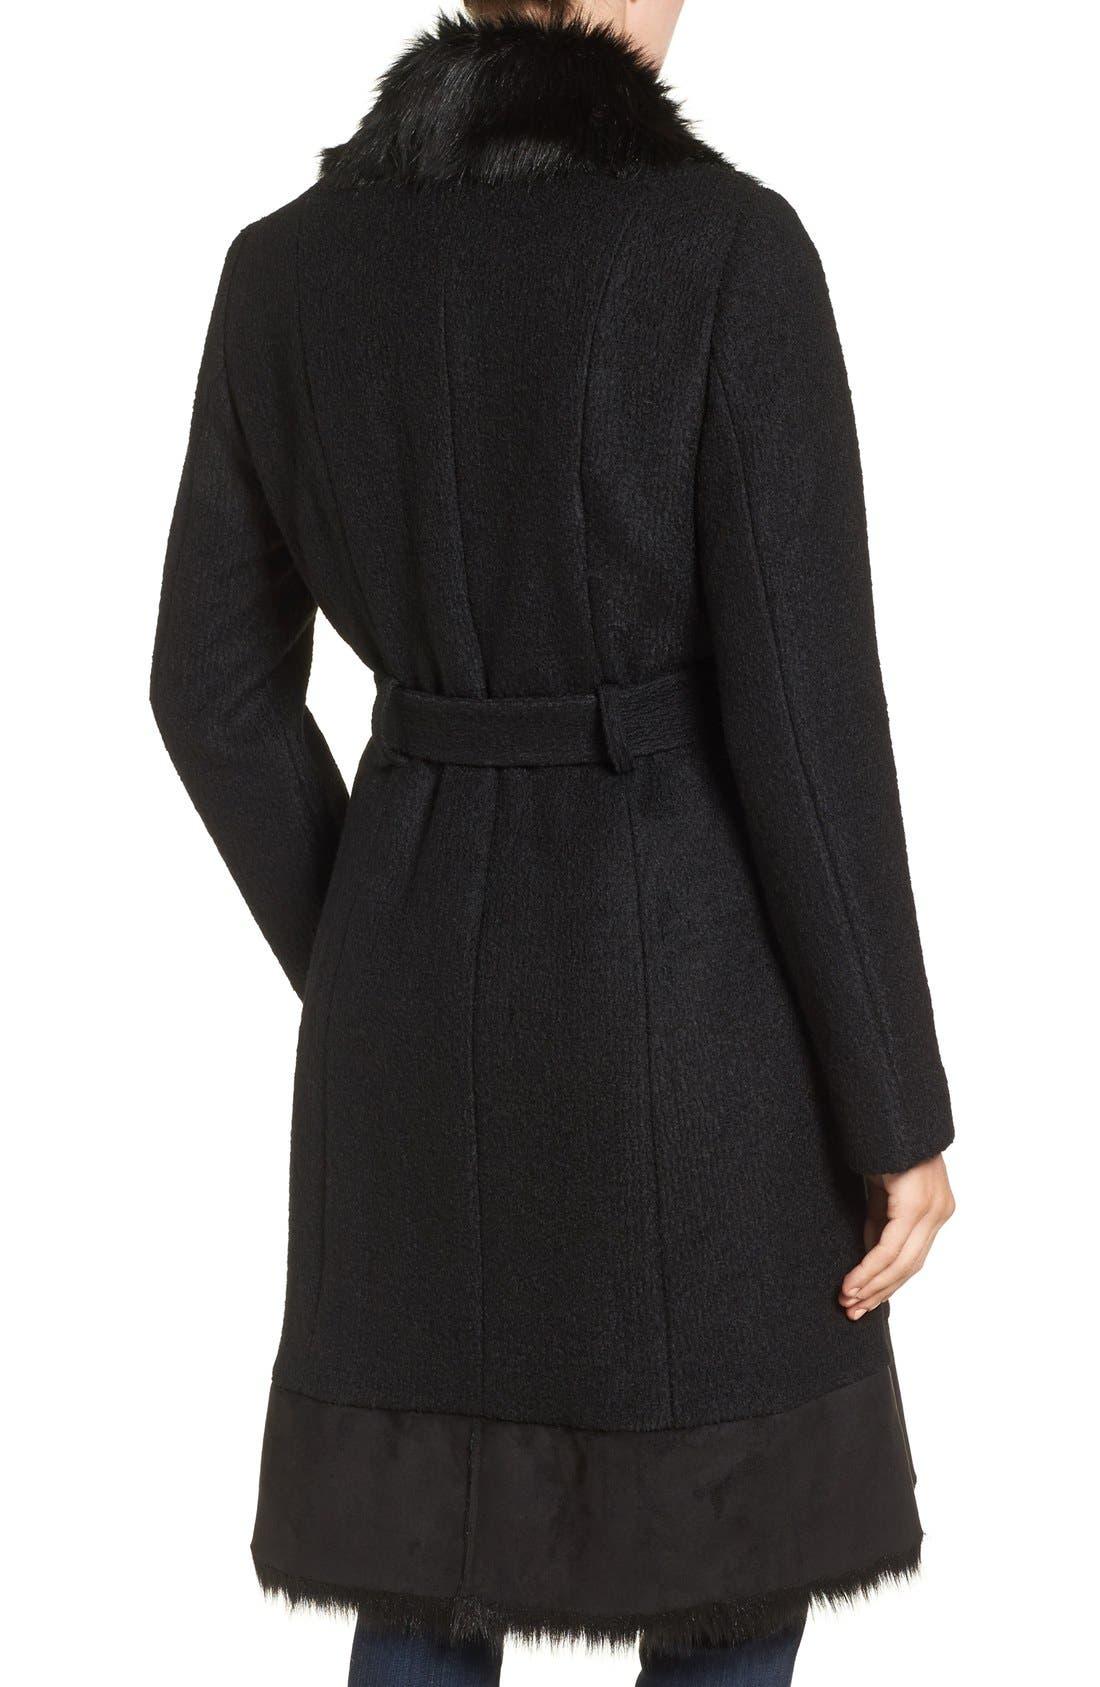 Alternate Image 2  - Vince Camuto Faux Shearling Trim Belted Wool Blend Long Coat